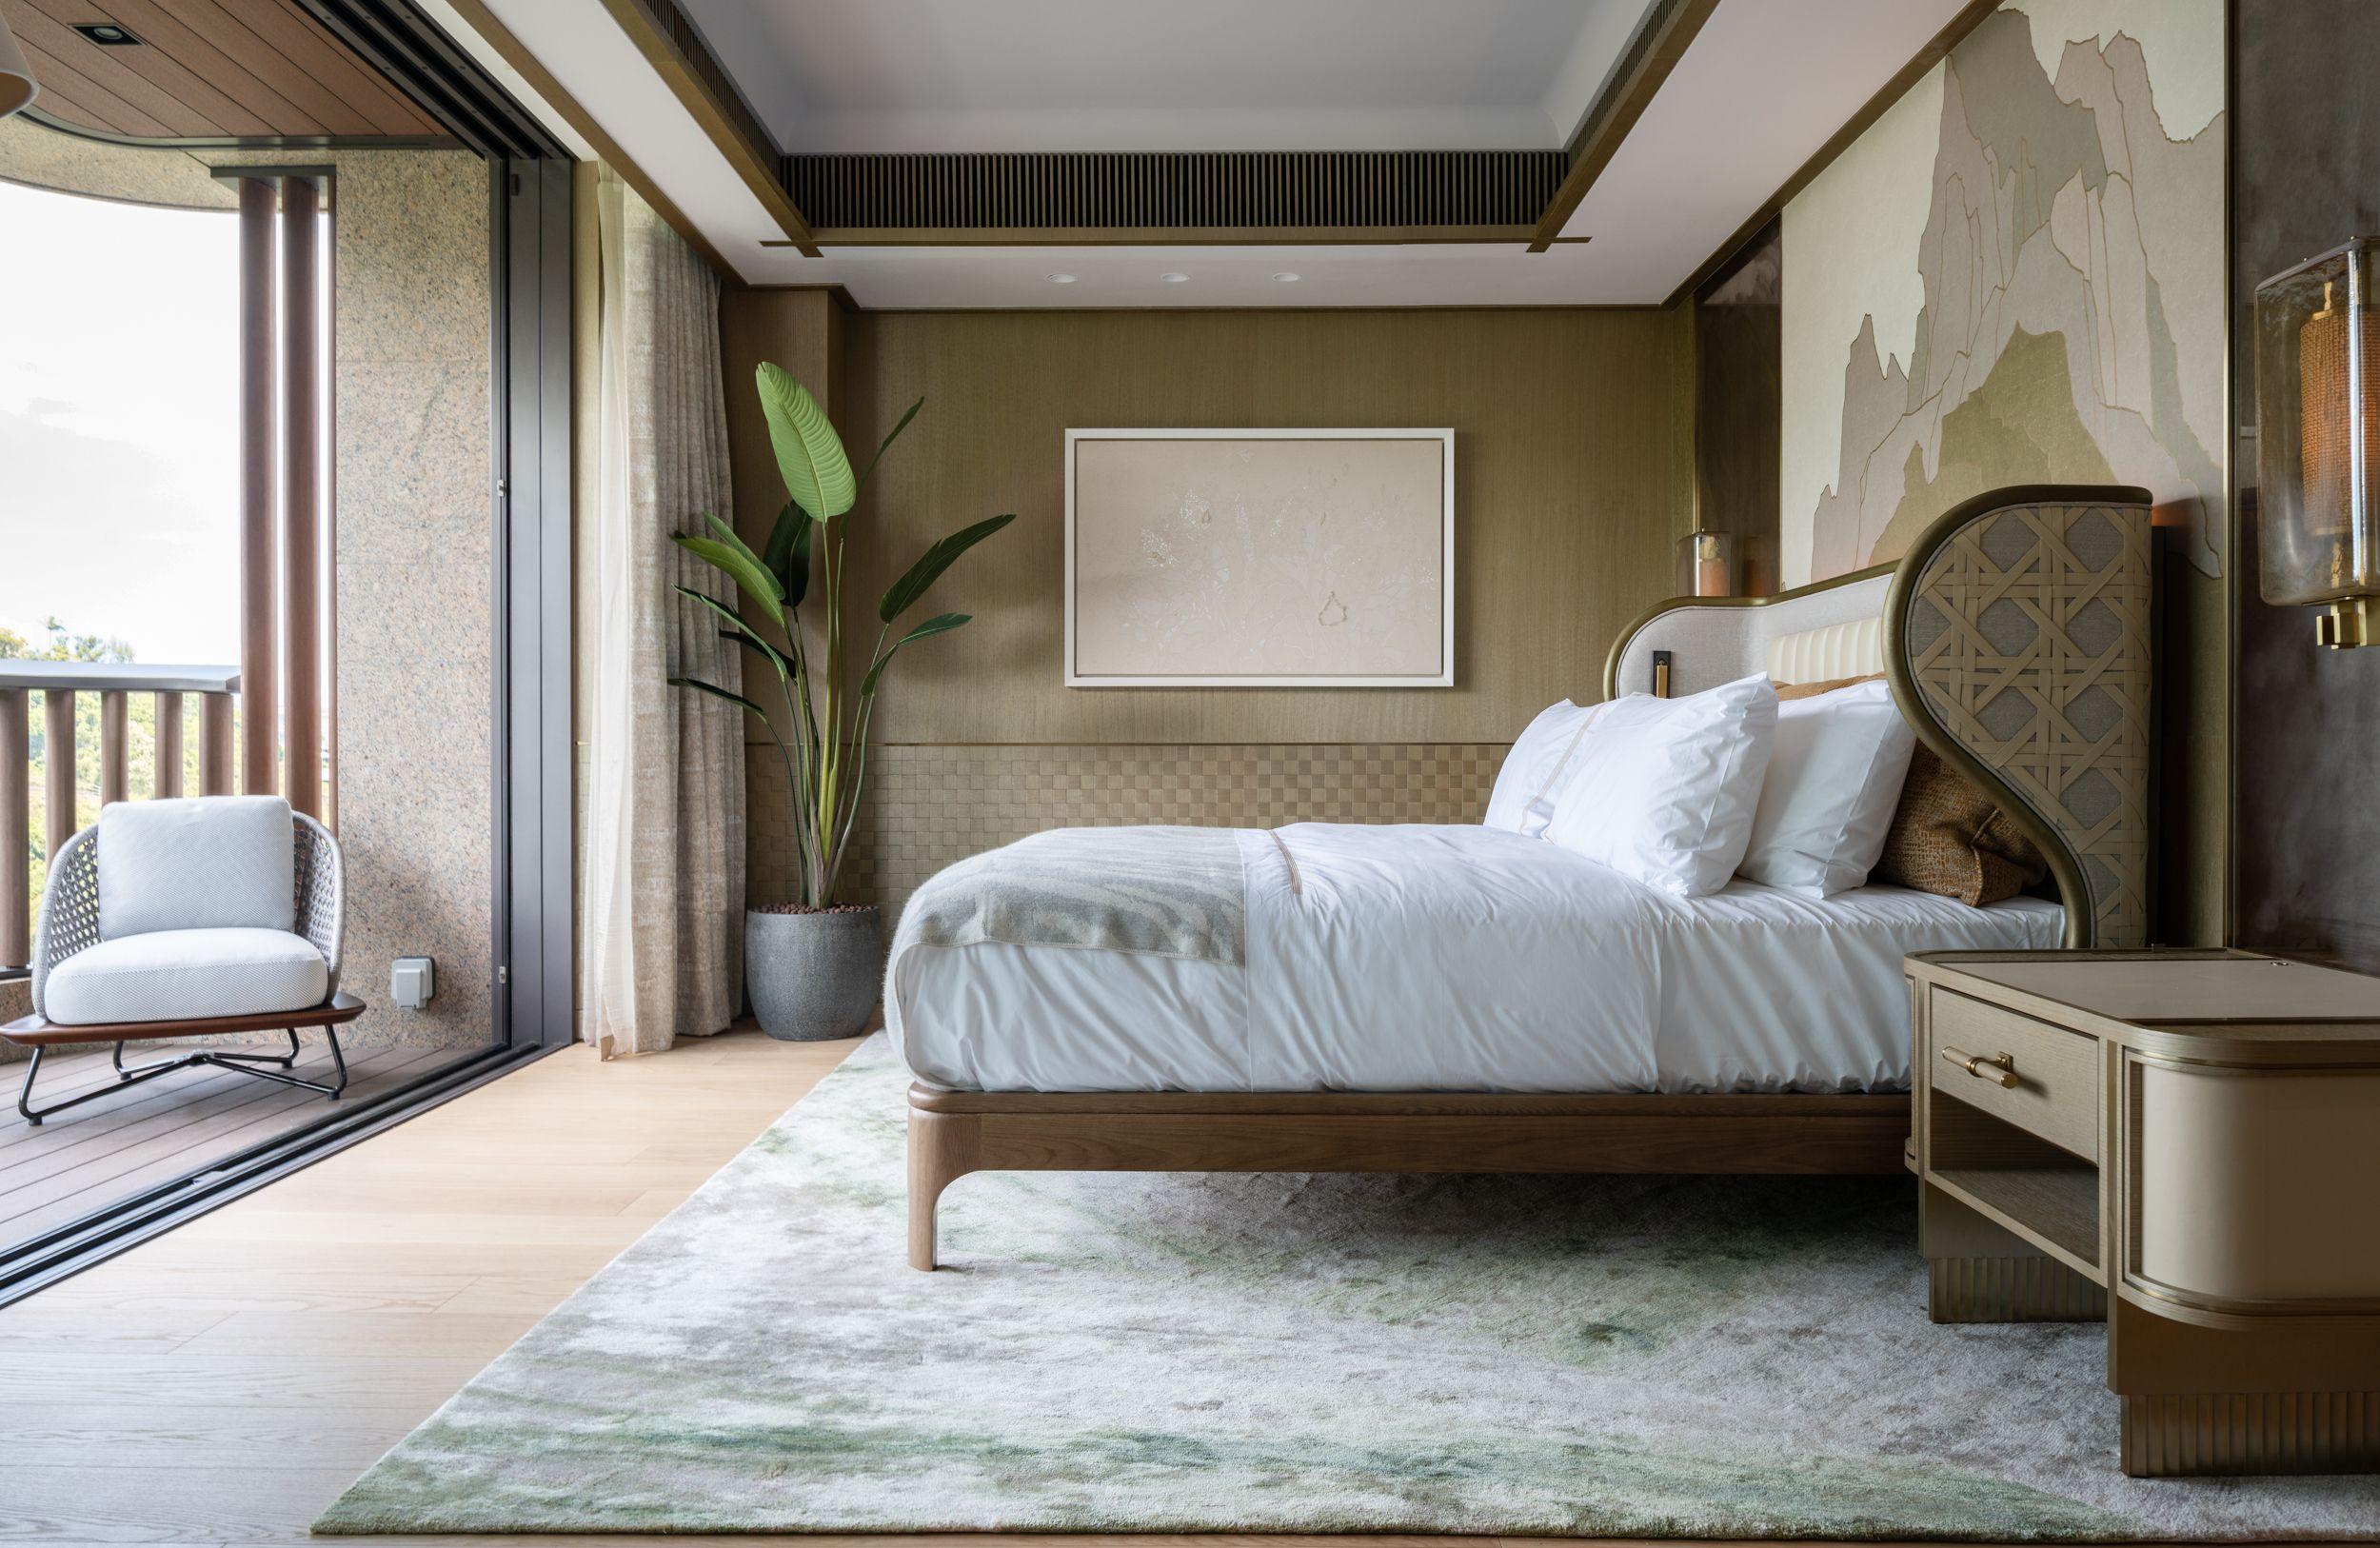 Pin By Mananya Pakornsiriwongs On Bedroom Luxury Home Decor